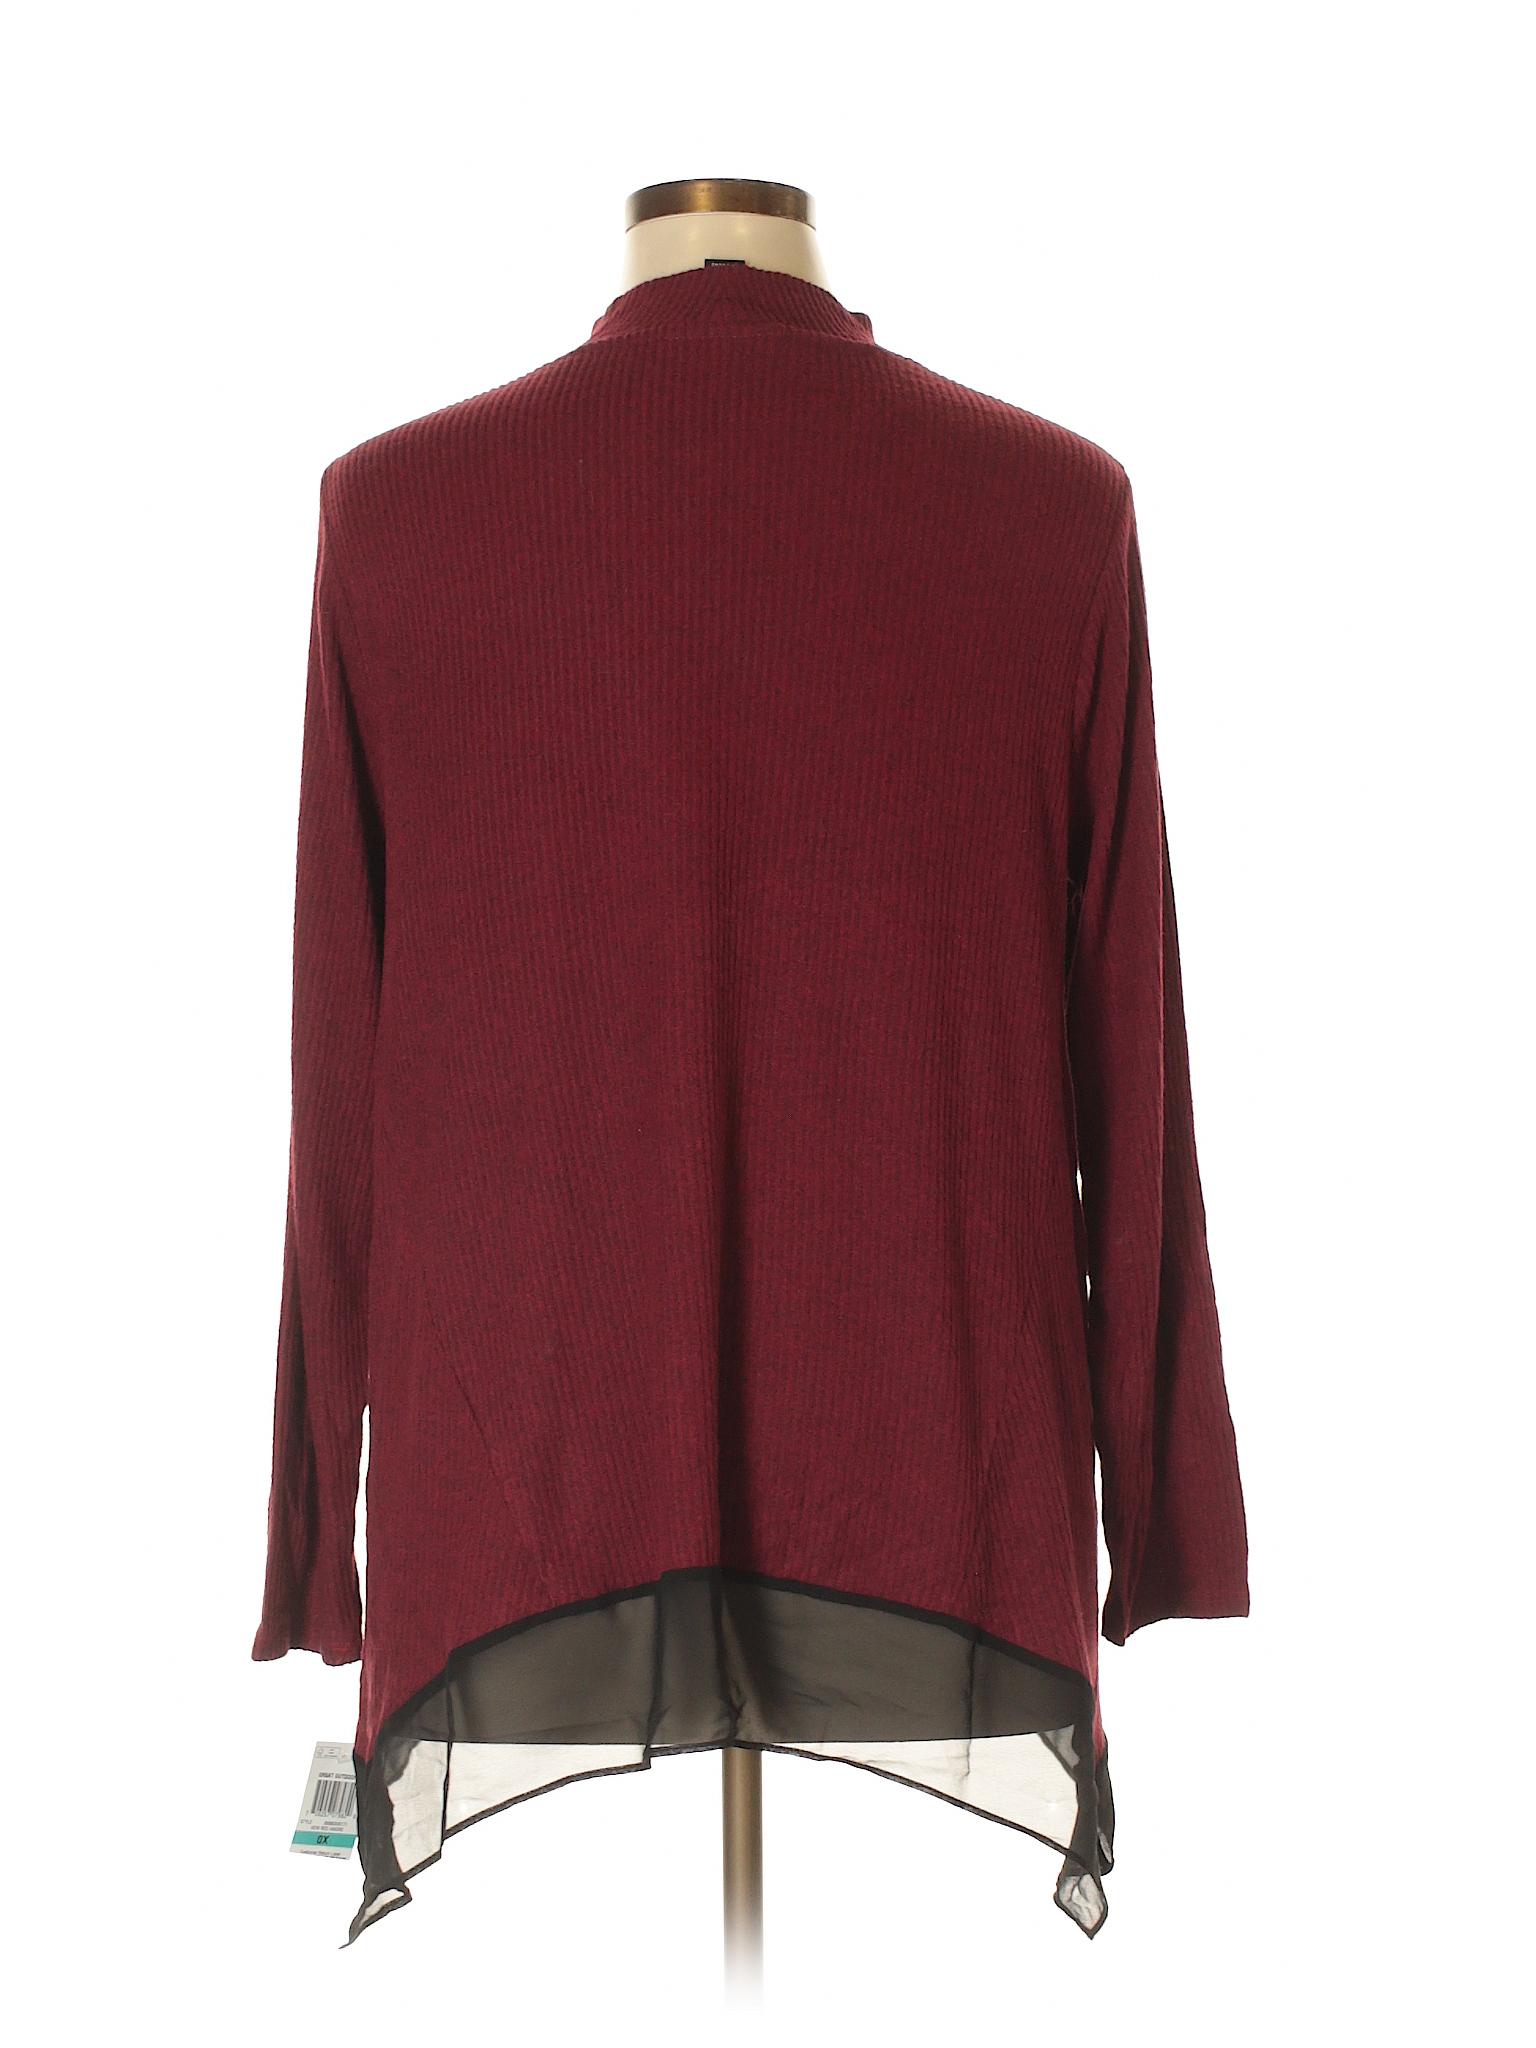 Pullover winter amp;Co Boutique Sweater Style AtqxZP